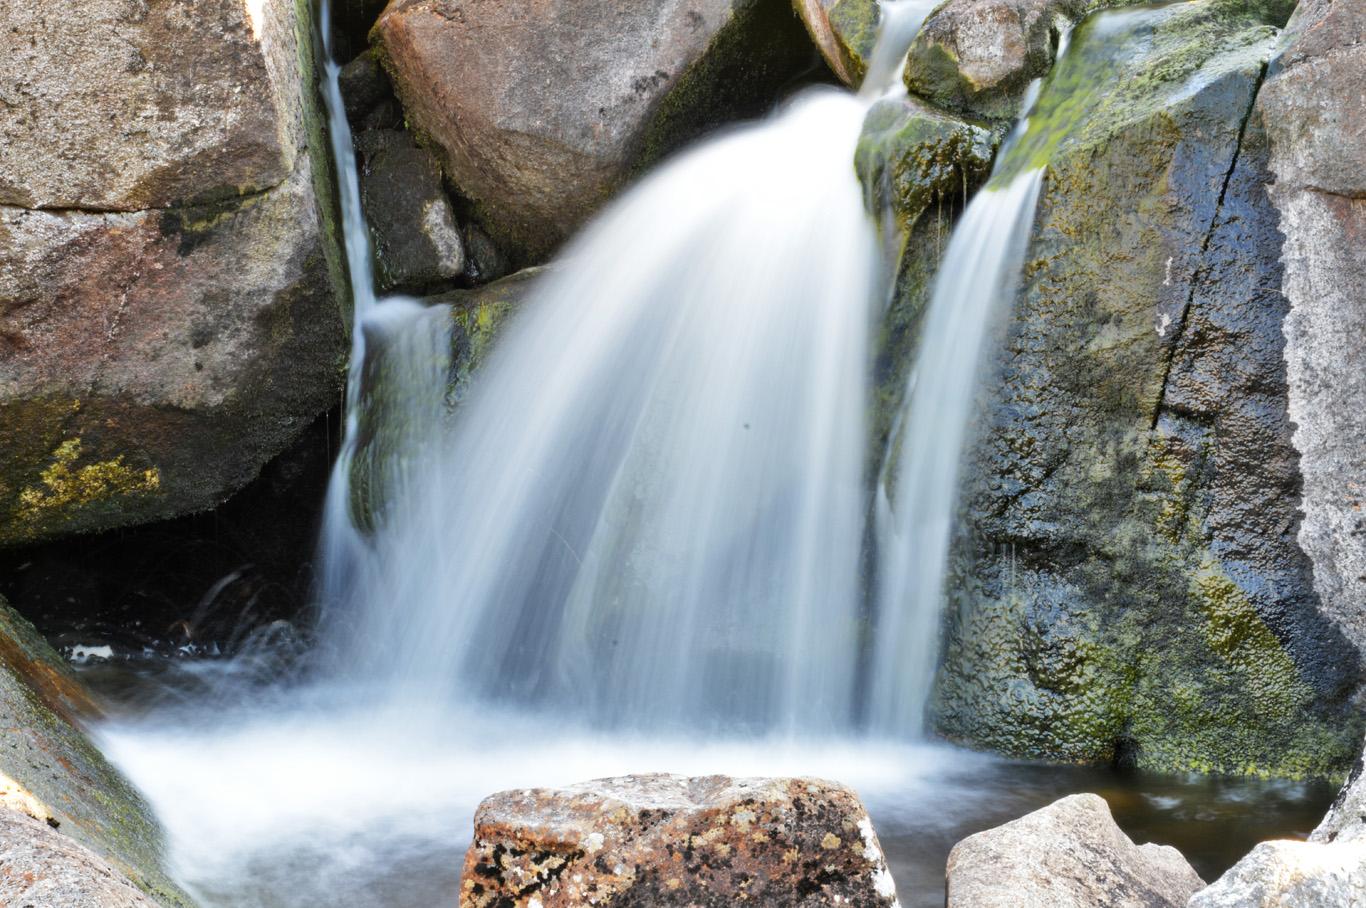 Waterfall on Glenealo river - long exposure photo